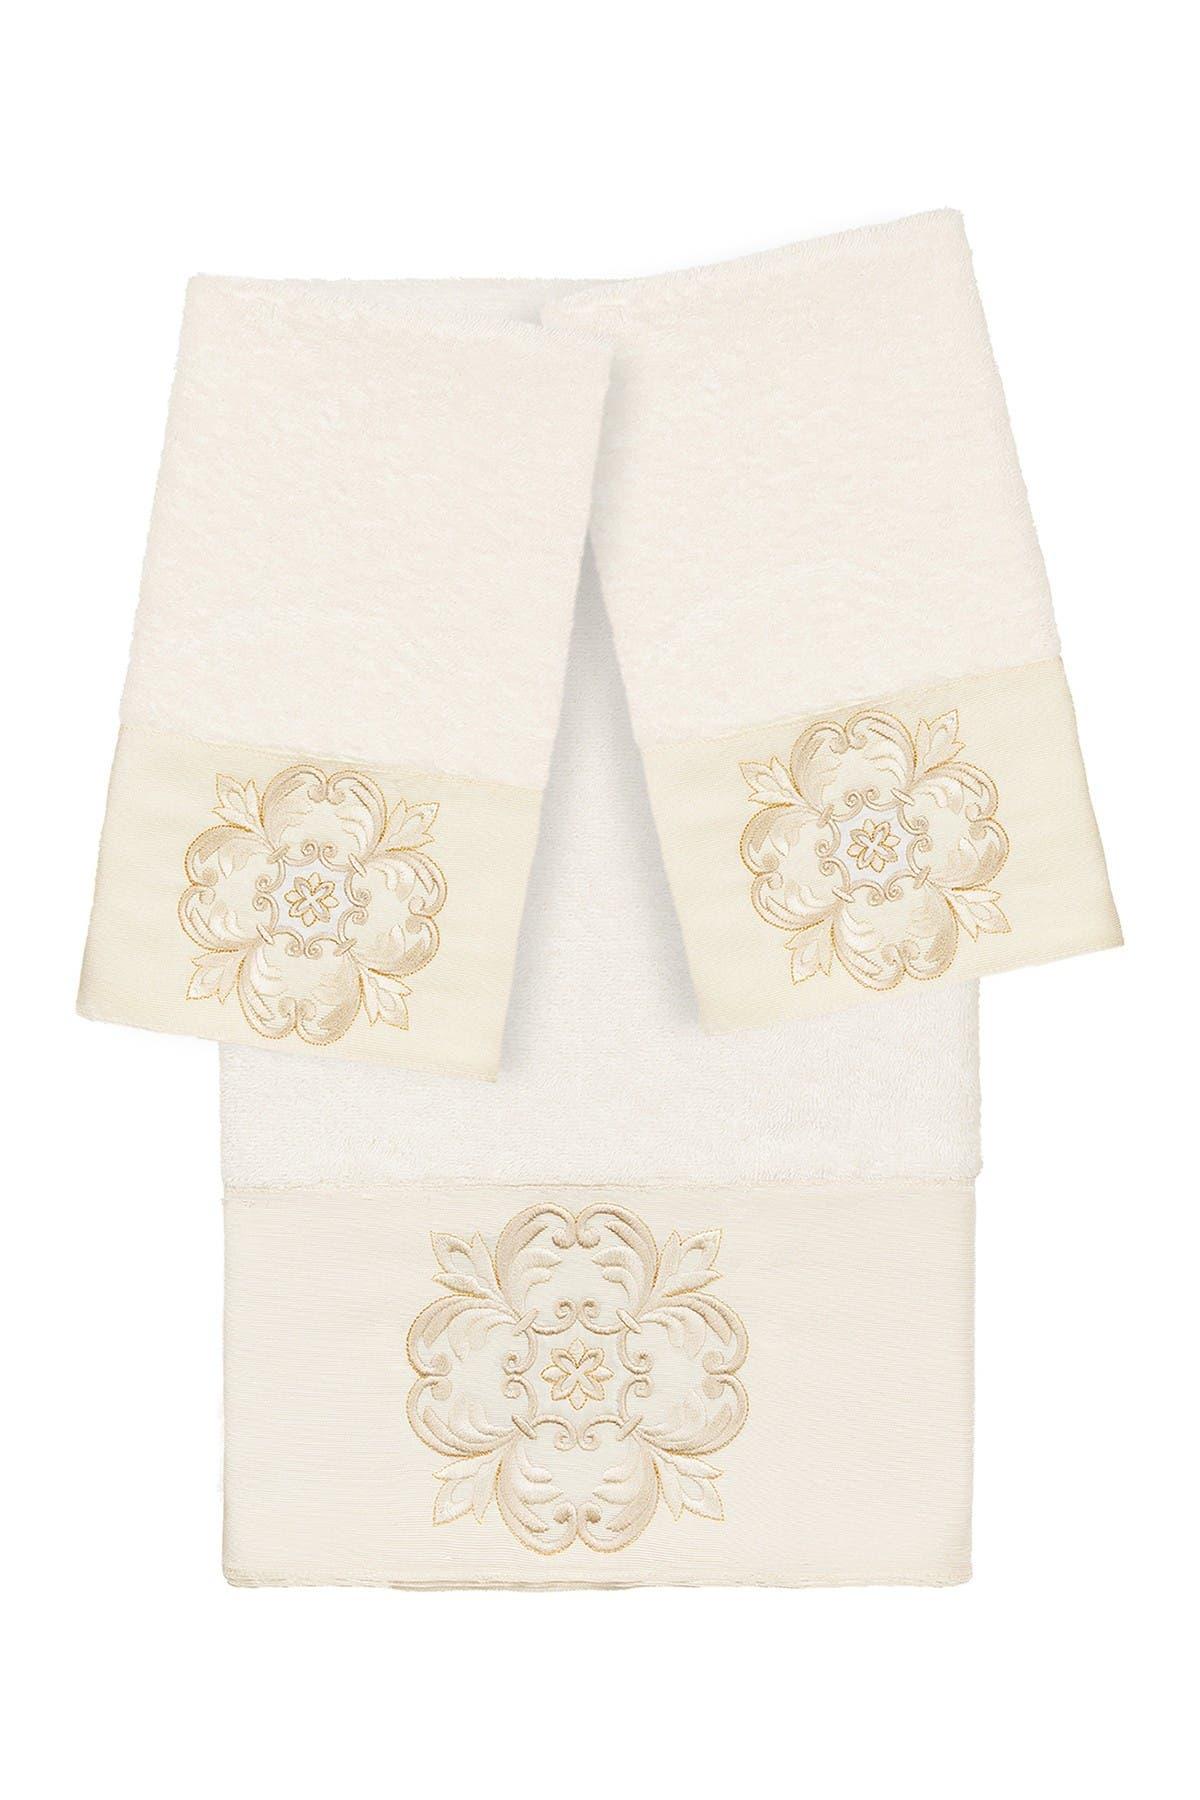 Image of LINUM HOME Alyssa 3-Piece Embellished Towel - Cream